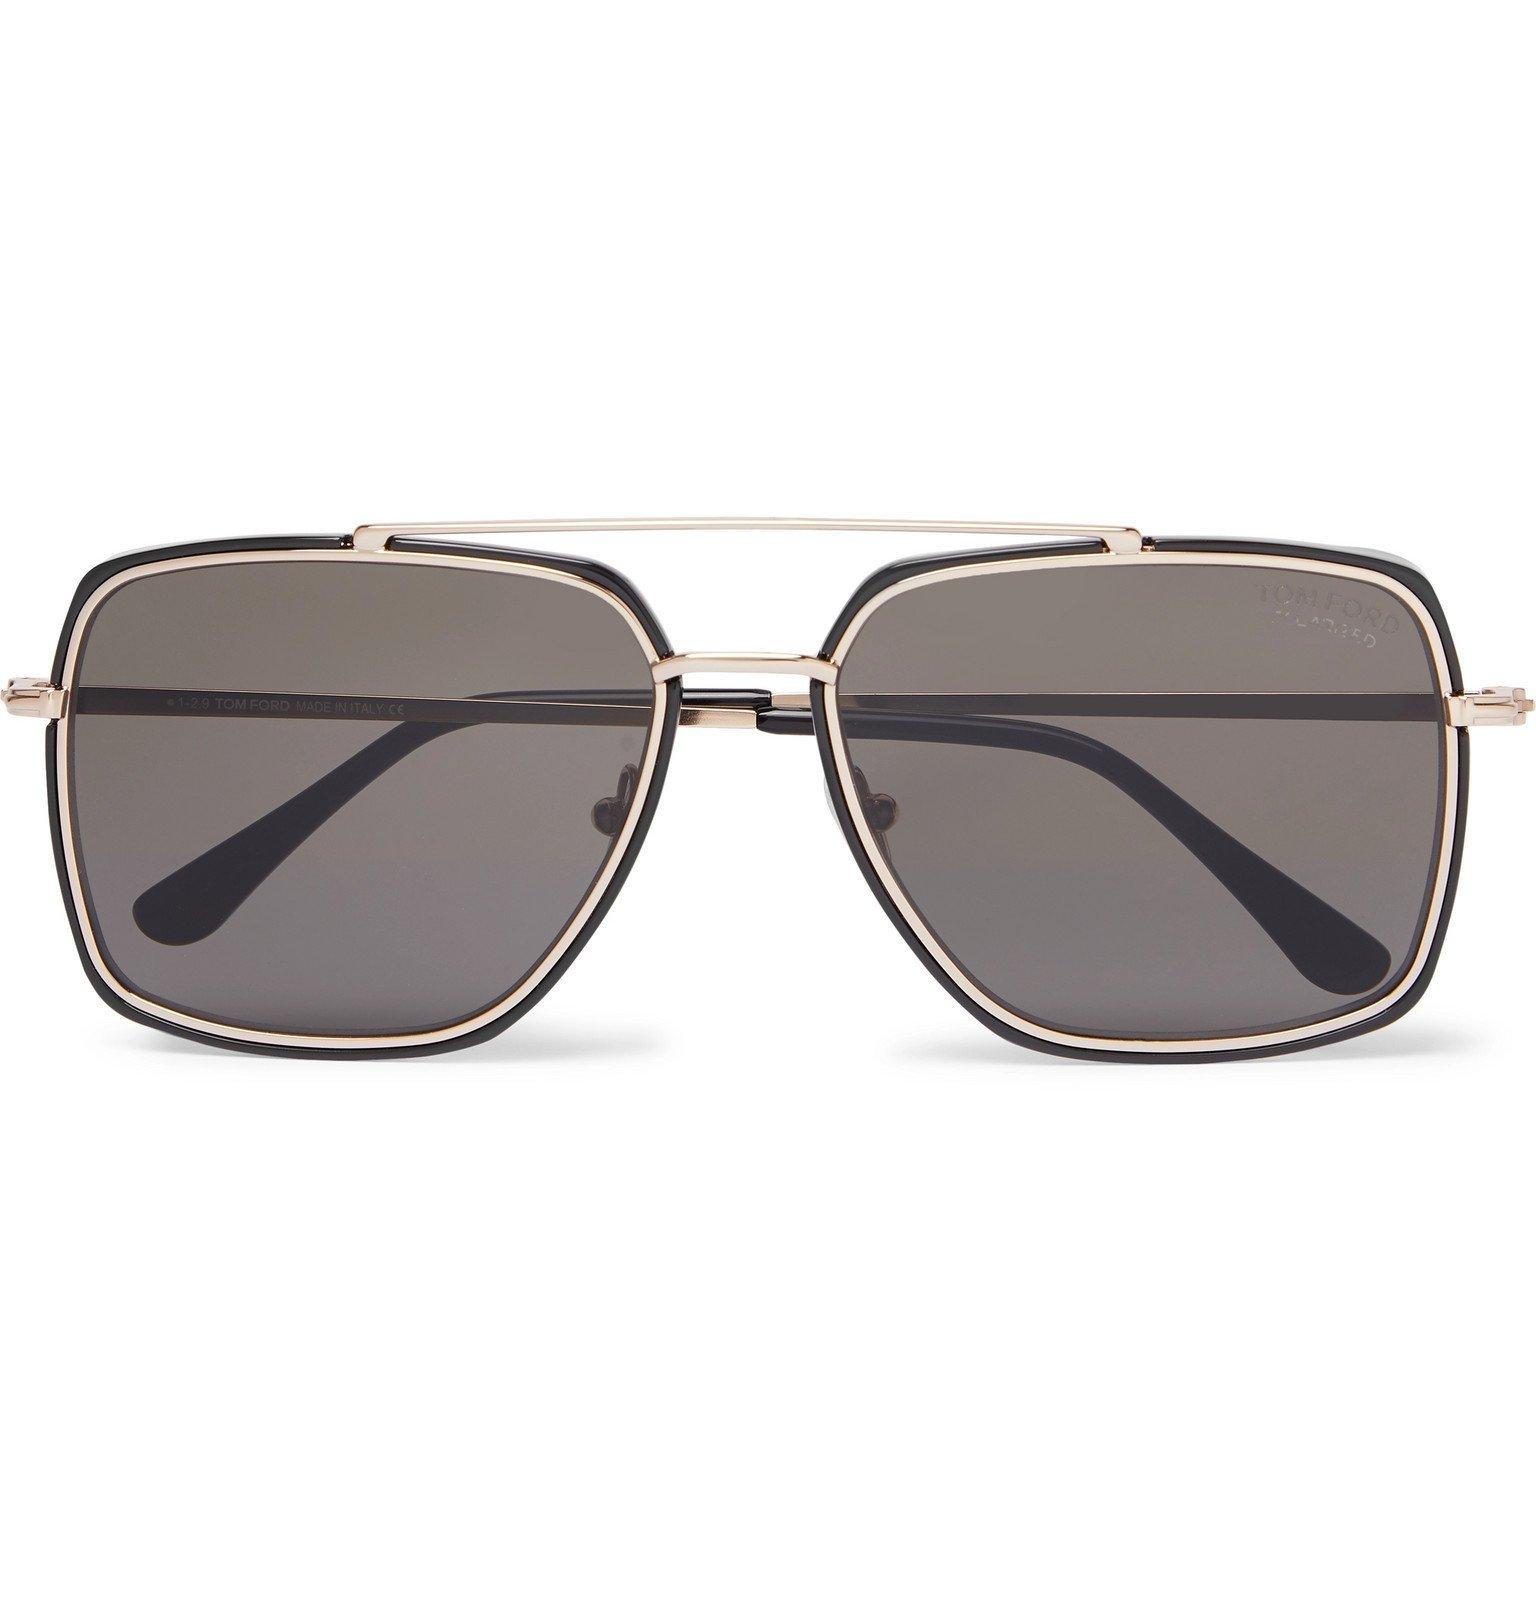 Photo: TOM FORD - Aviator-Style Acetate and Gold-Tone Sunglasses - Black